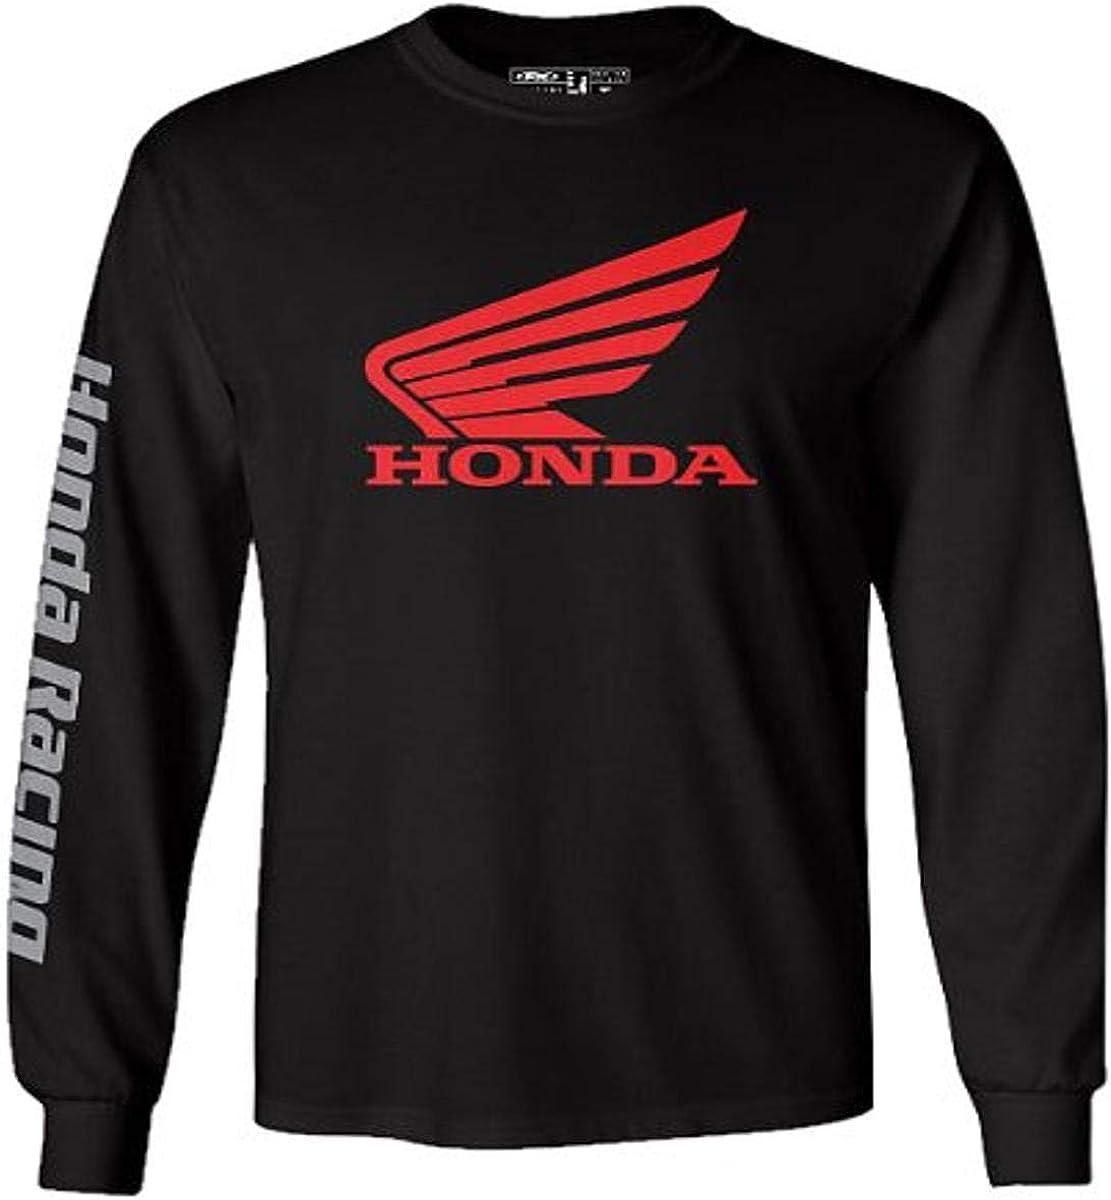 Factory Effex 'HONDA' 当店限定販売 Sleeve T-Shirt Long 正規逆輸入品